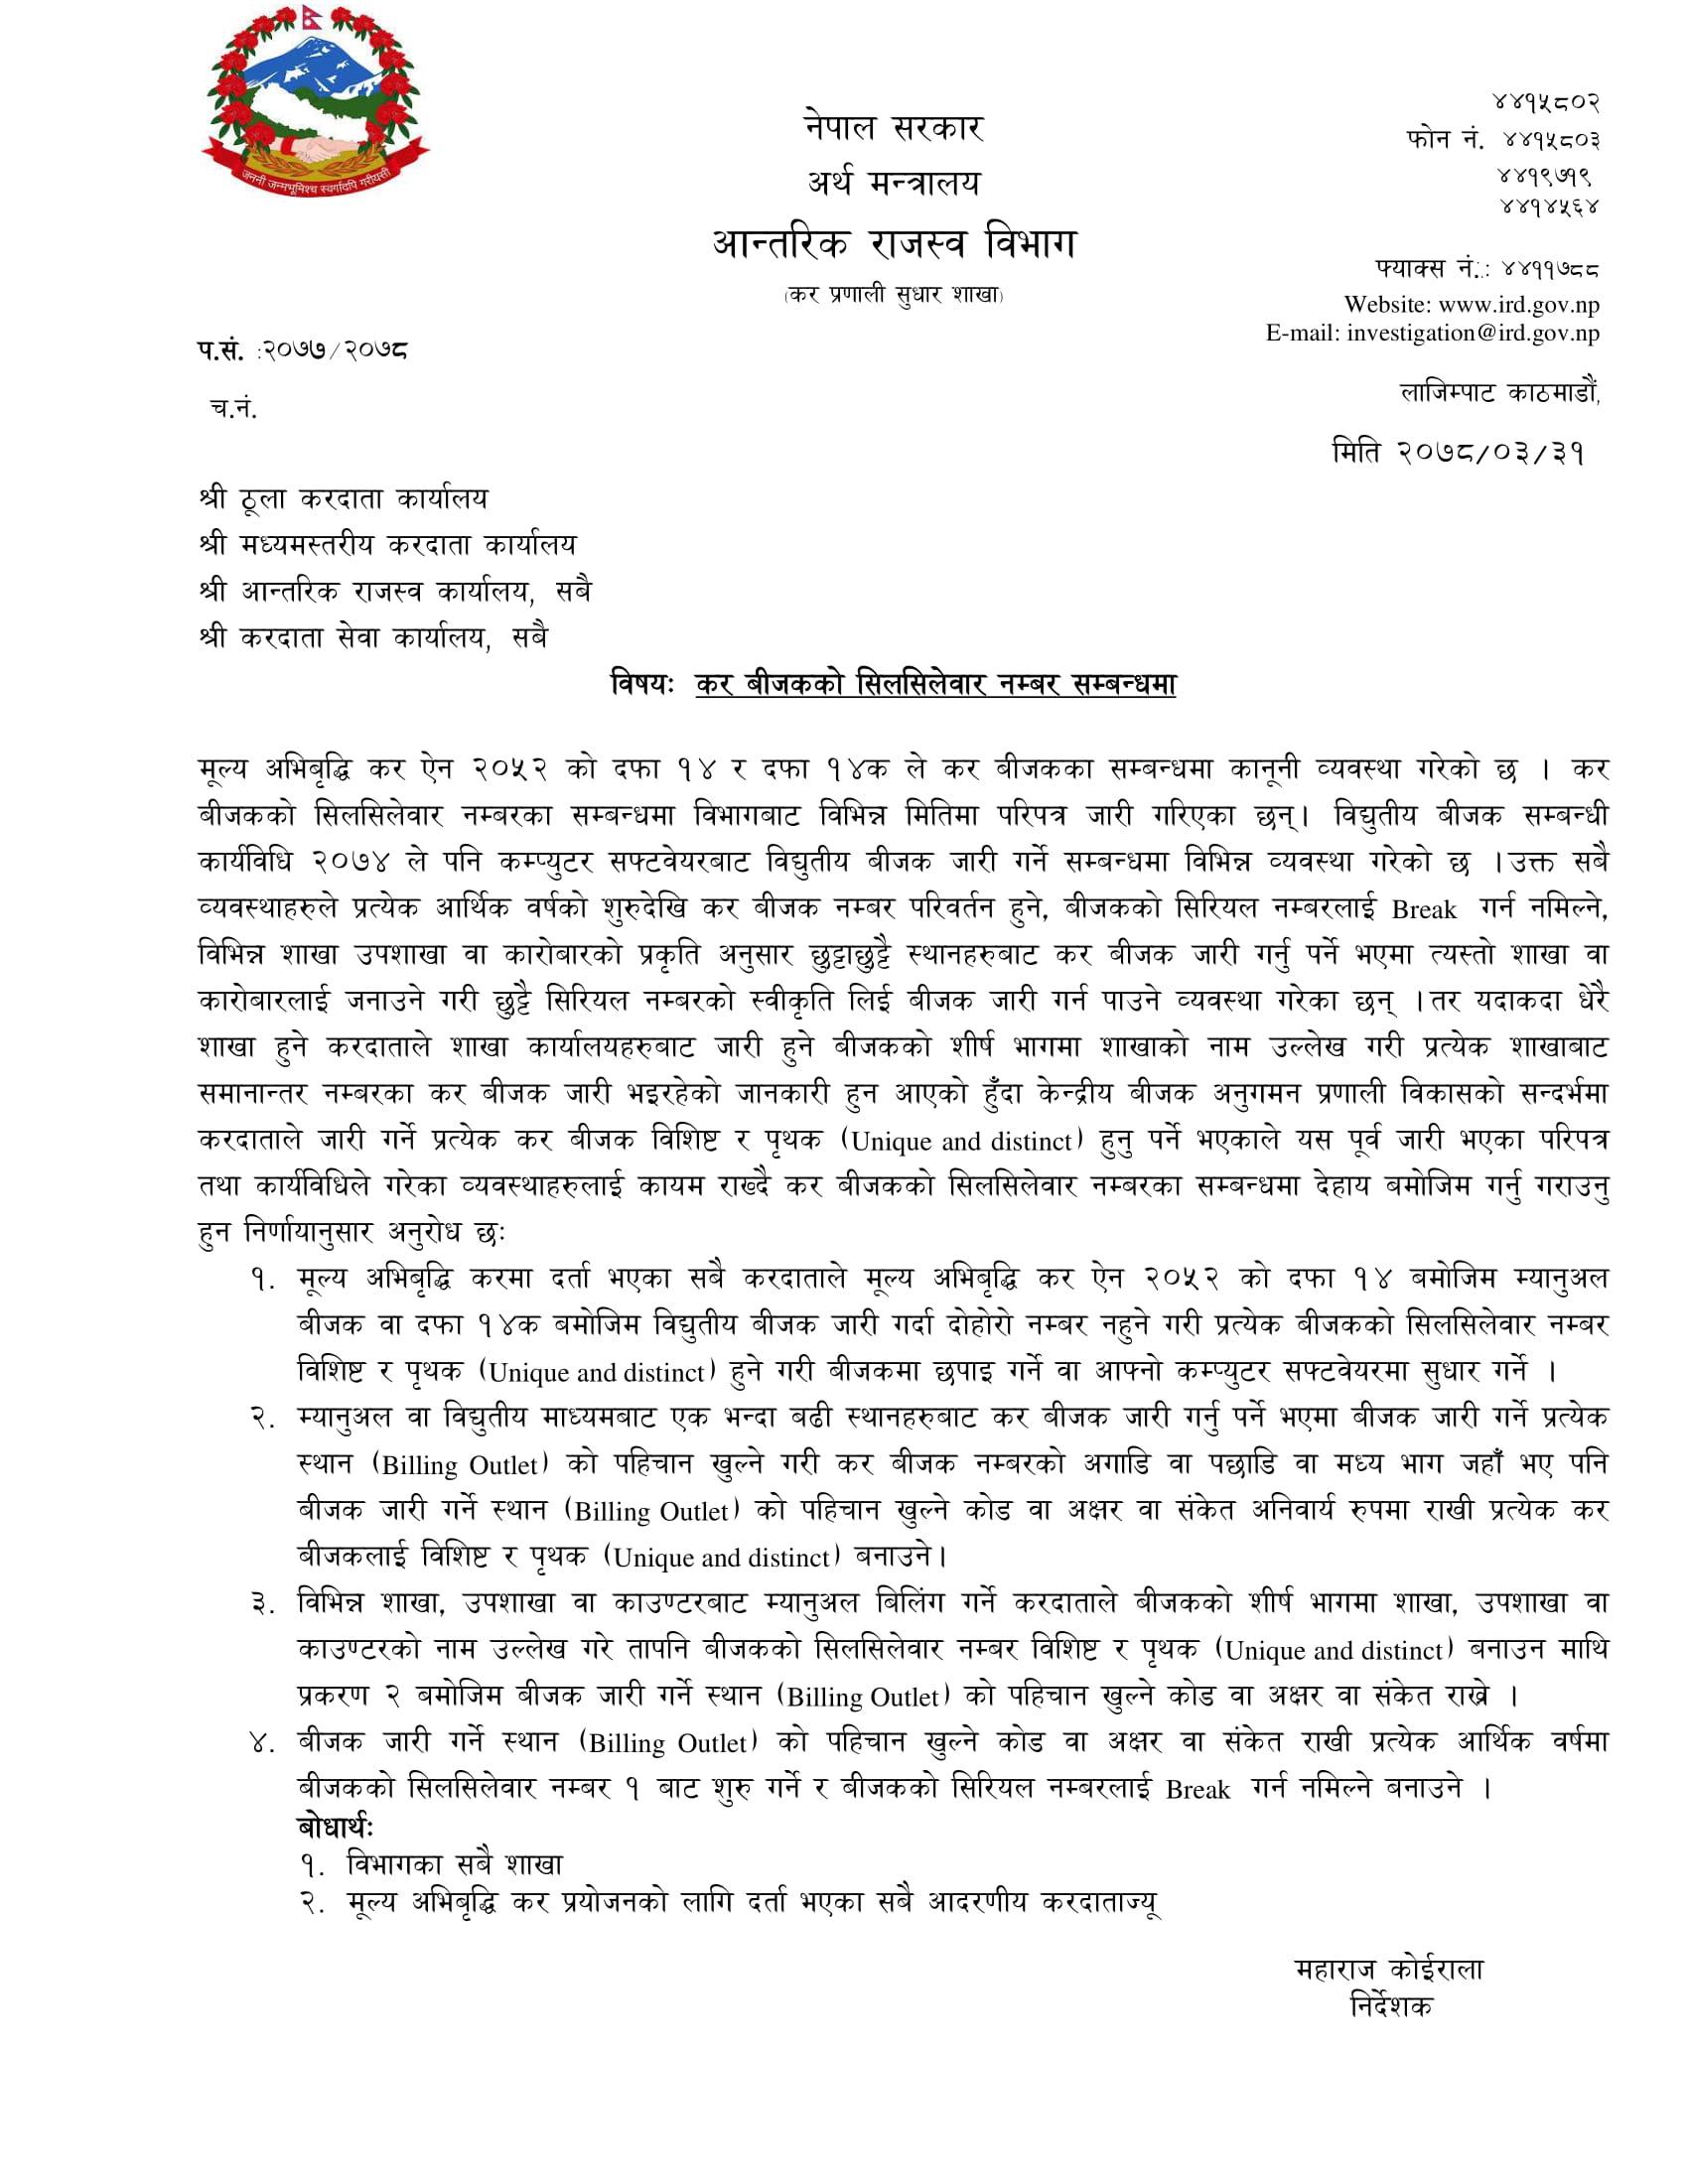 Circular regarding VAT Invoice Number